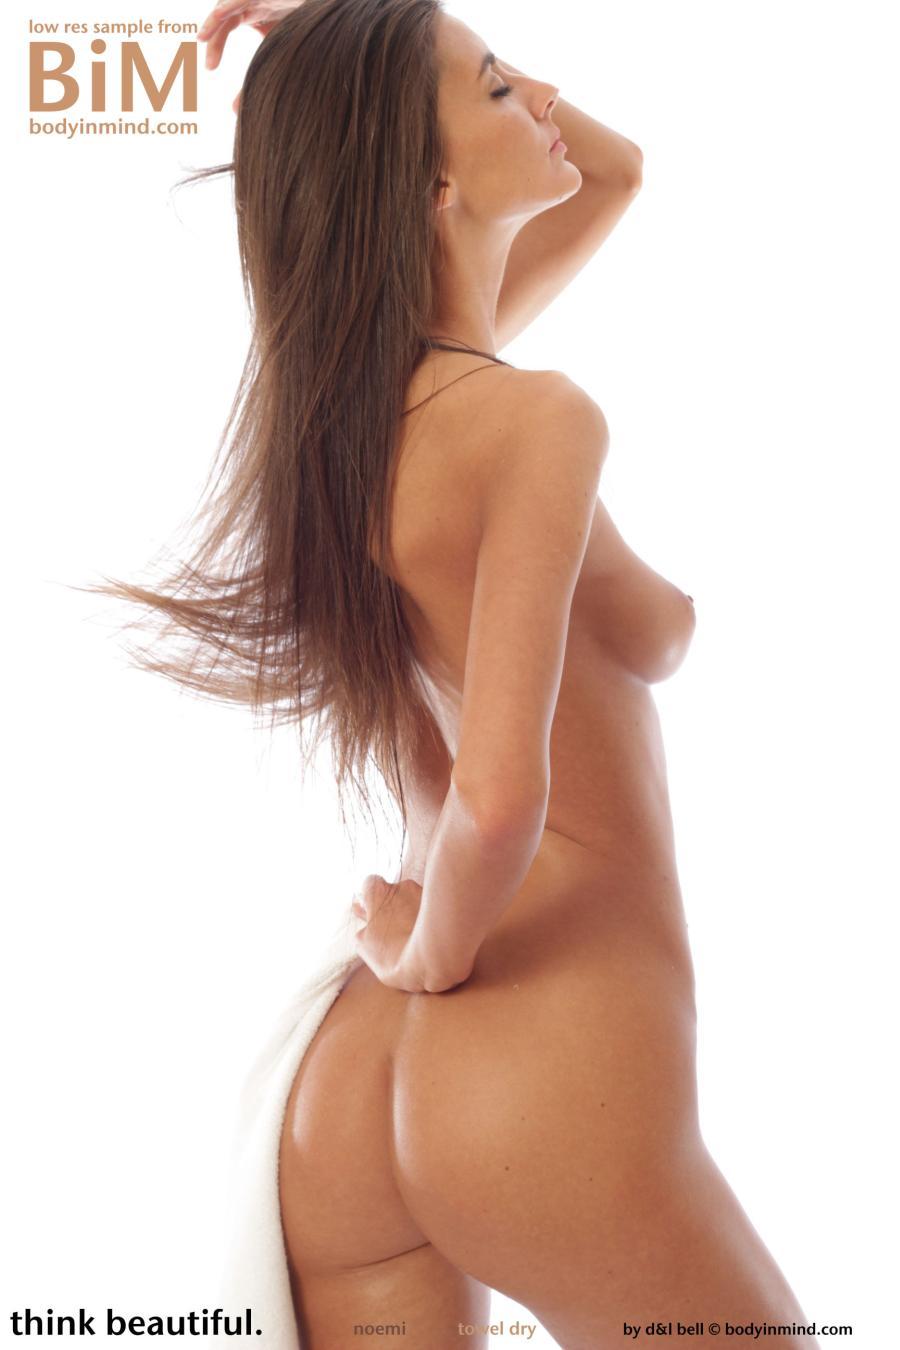 noemi-knappe-brunette-gaat-naakt-12